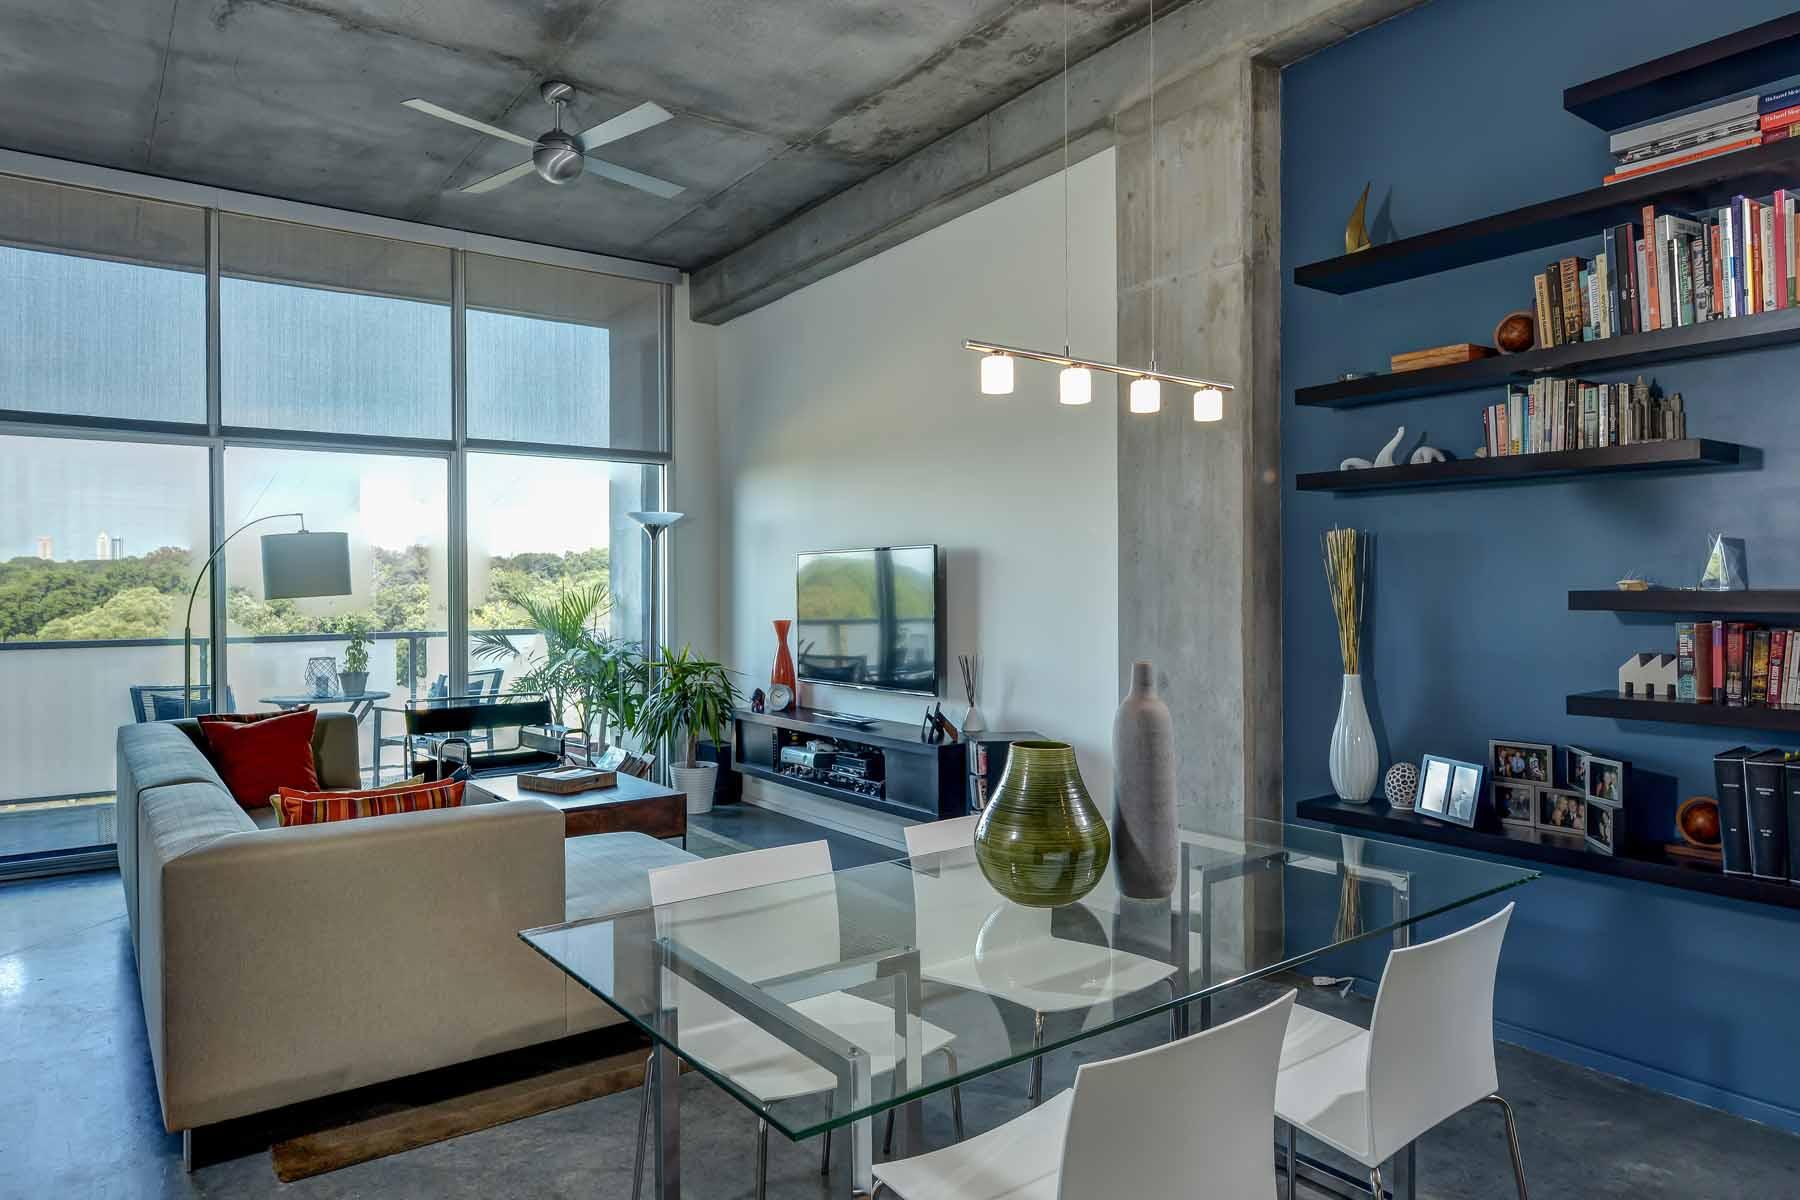 Single Family Home for Sale at Upgraded Top Floor Loft with Skyline View from Balcony 130 Arizona Avenue NE Unit 409 Atlanta, Georgia 30307 United States